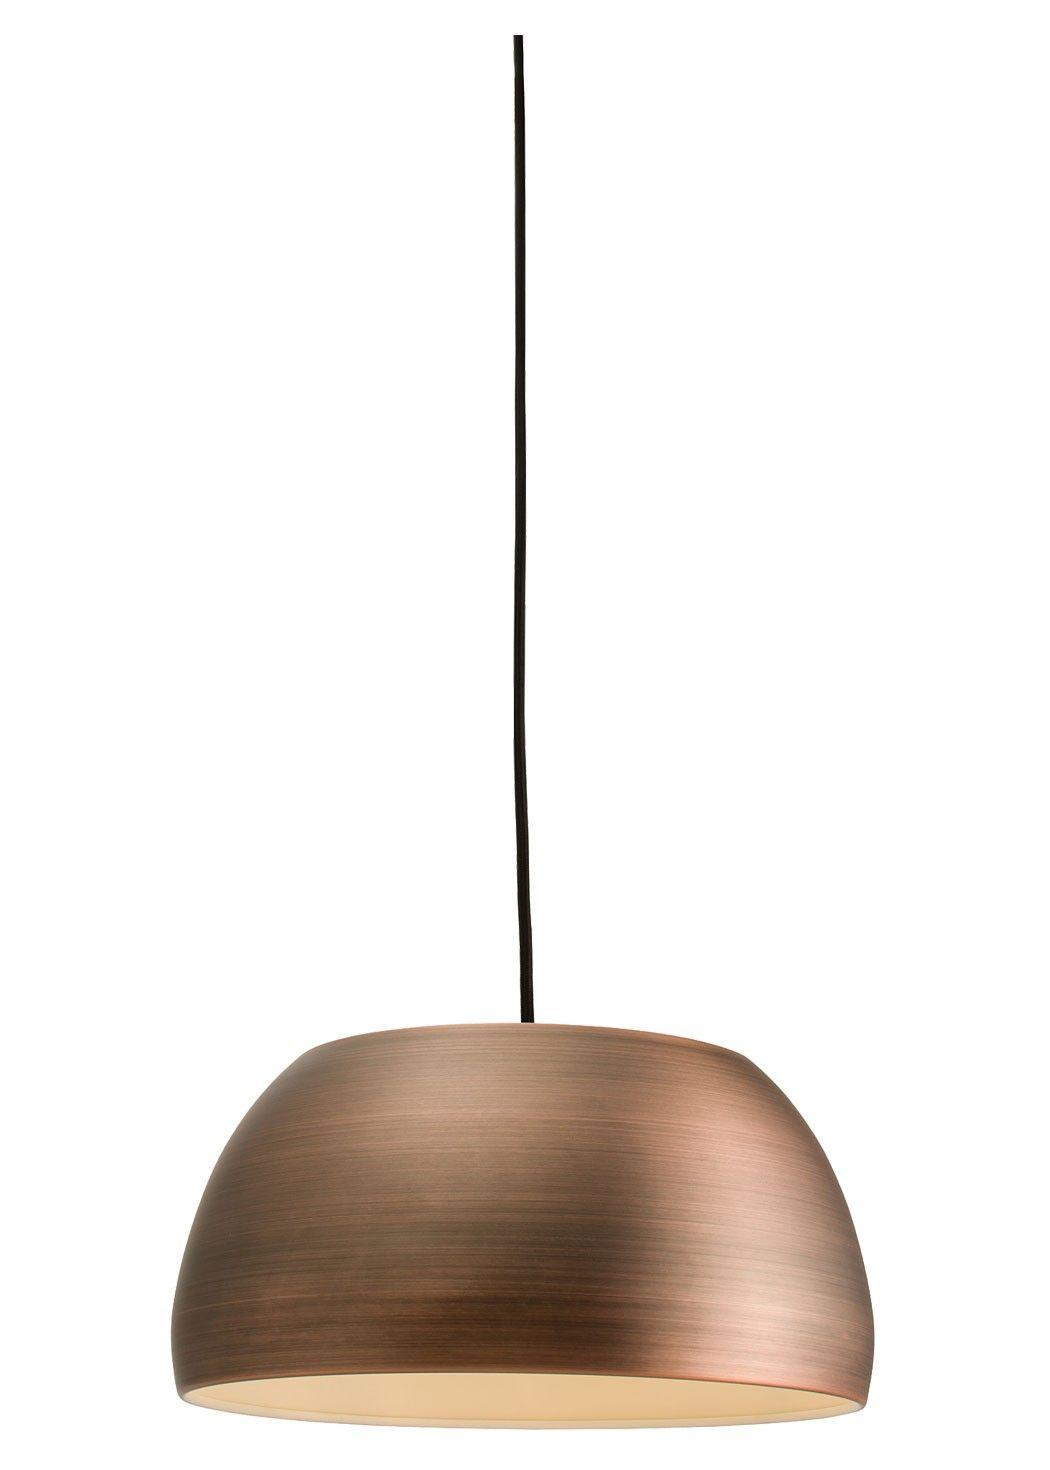 Endon connery pendant ceiling light bronze ceiling bronze pendant endon connery pendant ceiling light bronze arubaitofo Images